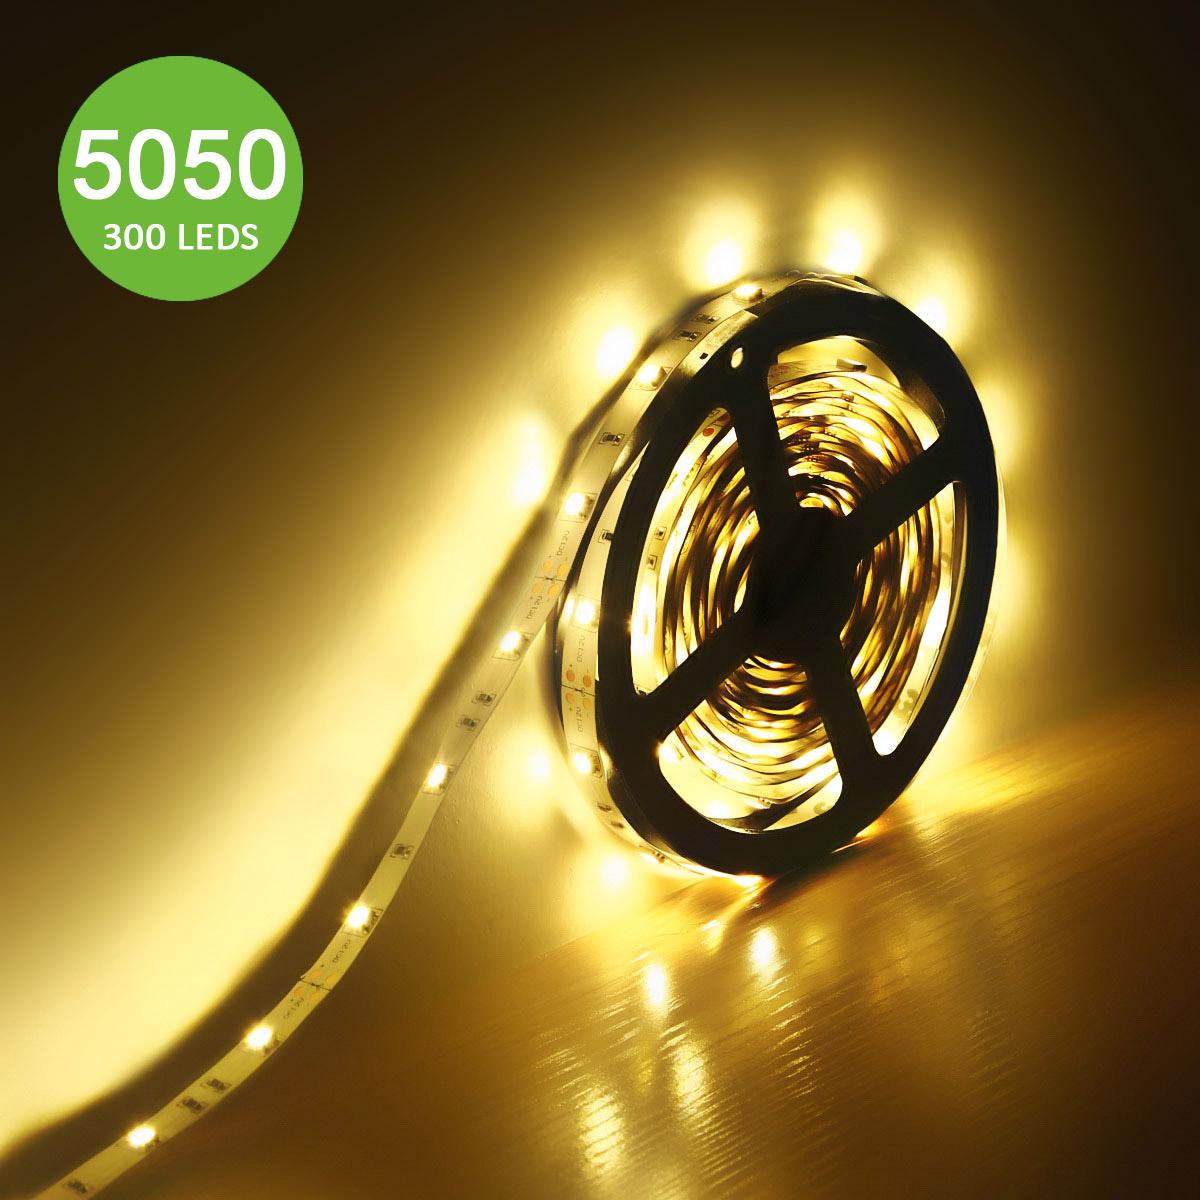 12V LED Strips, Dimmbar 360 lm/Meter, Warmweiß, 150 Stück 5050 SMD, Non-wasserdicht, 5M